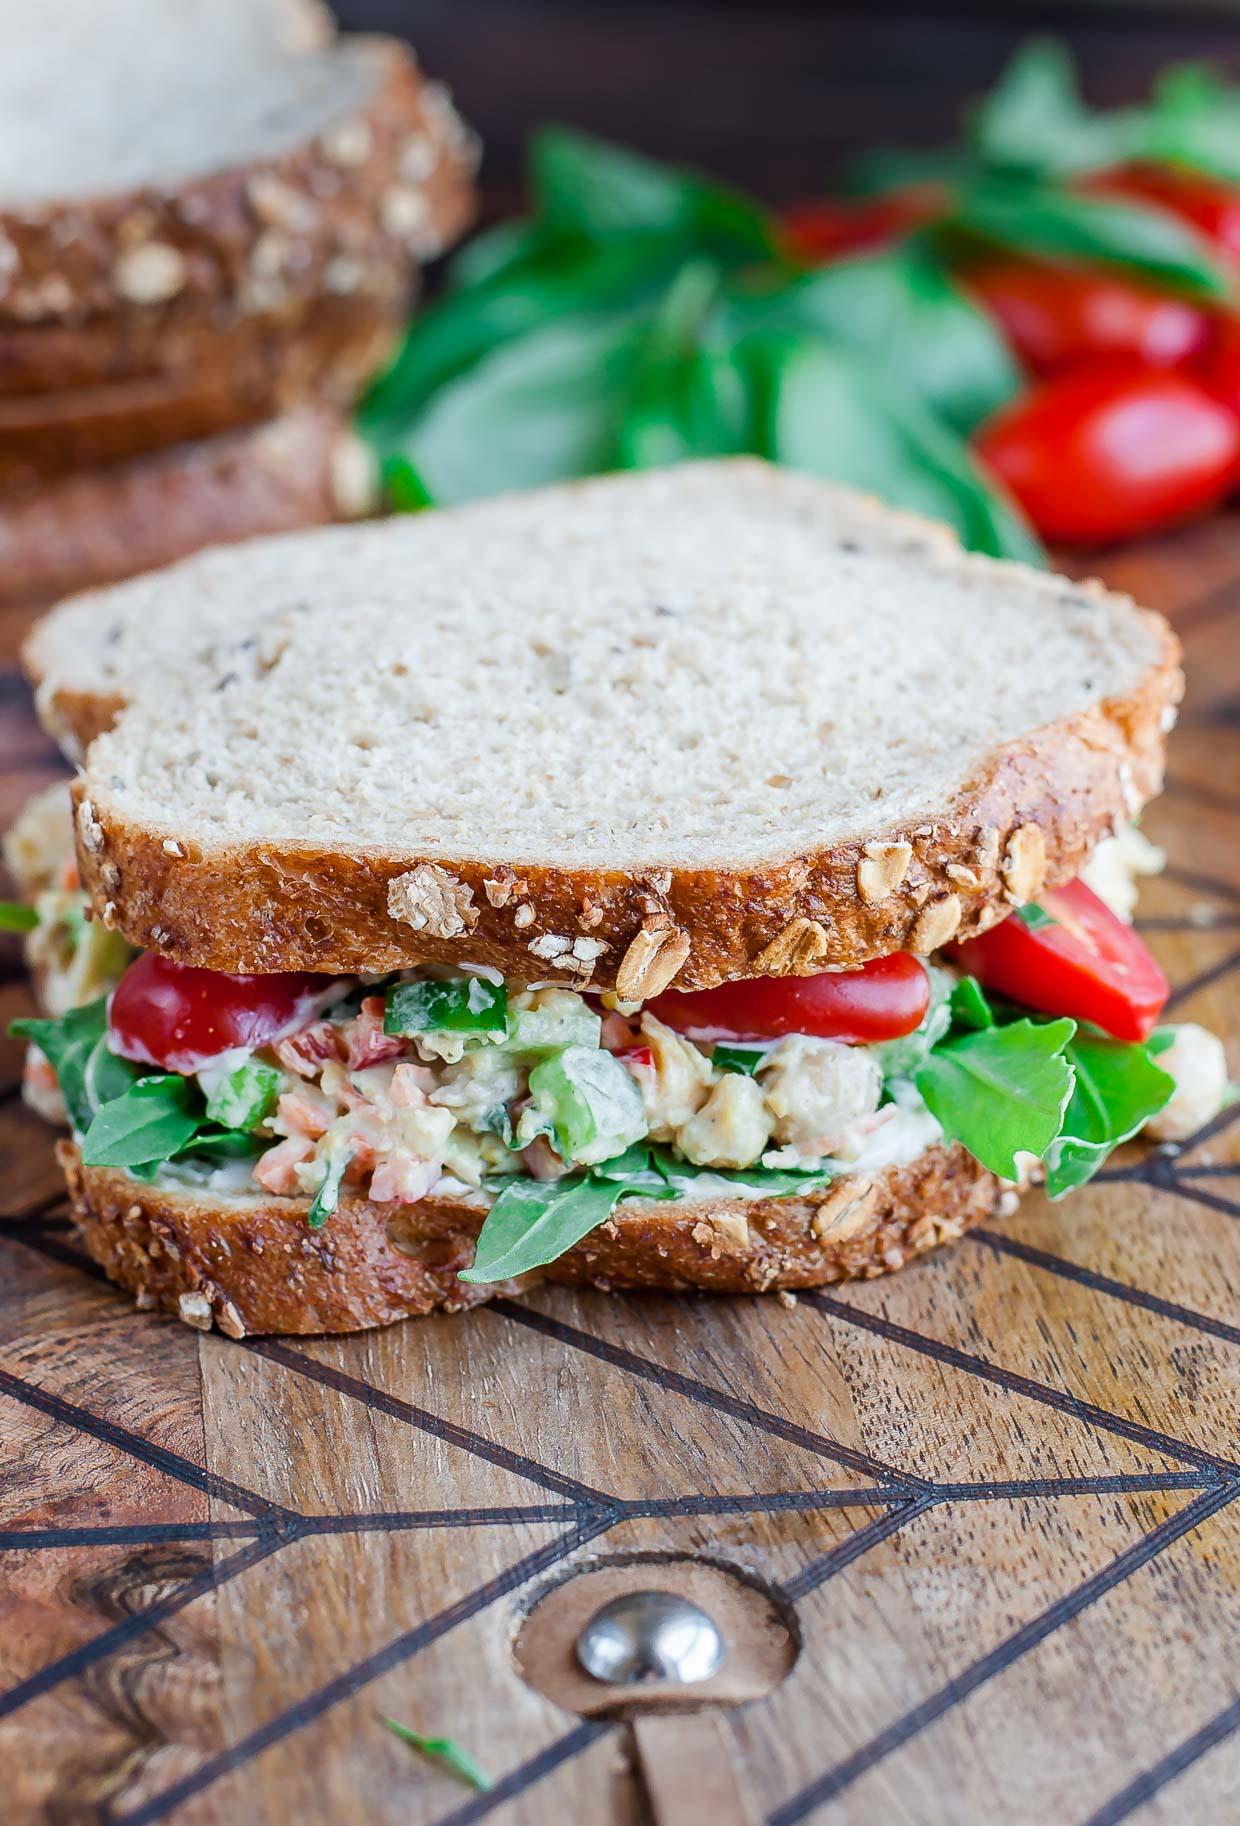 Tomato Basil Chickpea Salad Sandwich